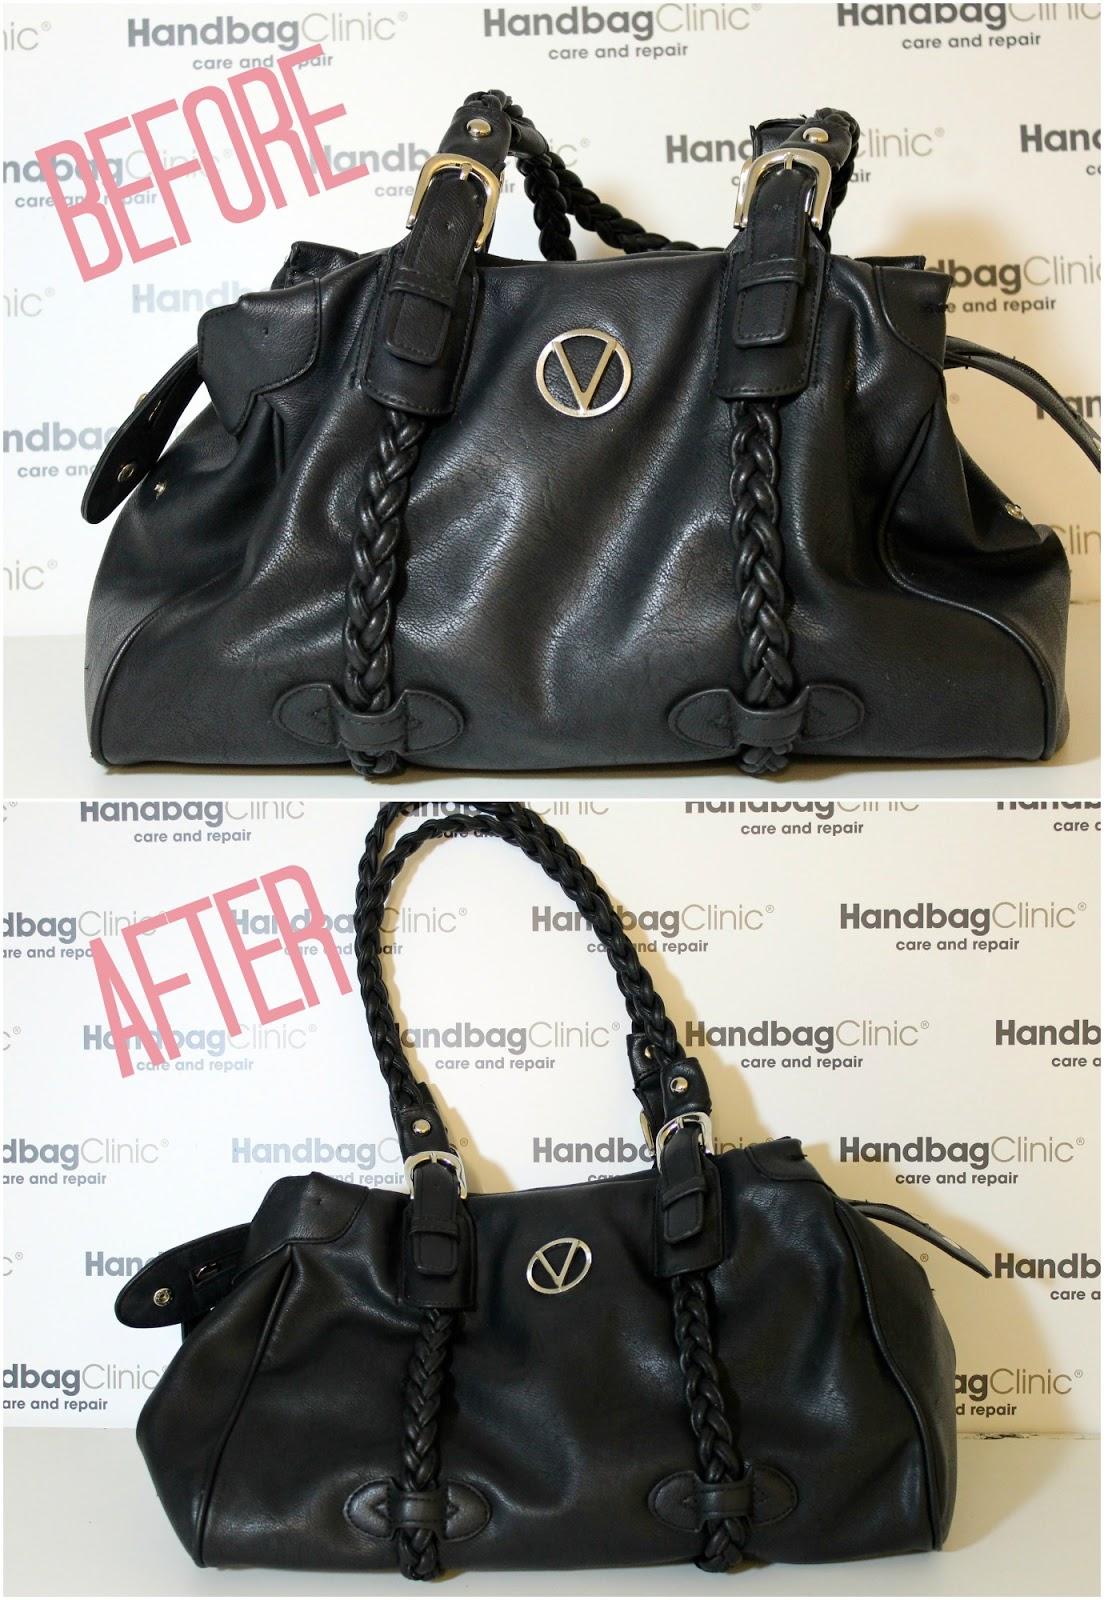 handbag clinic before after